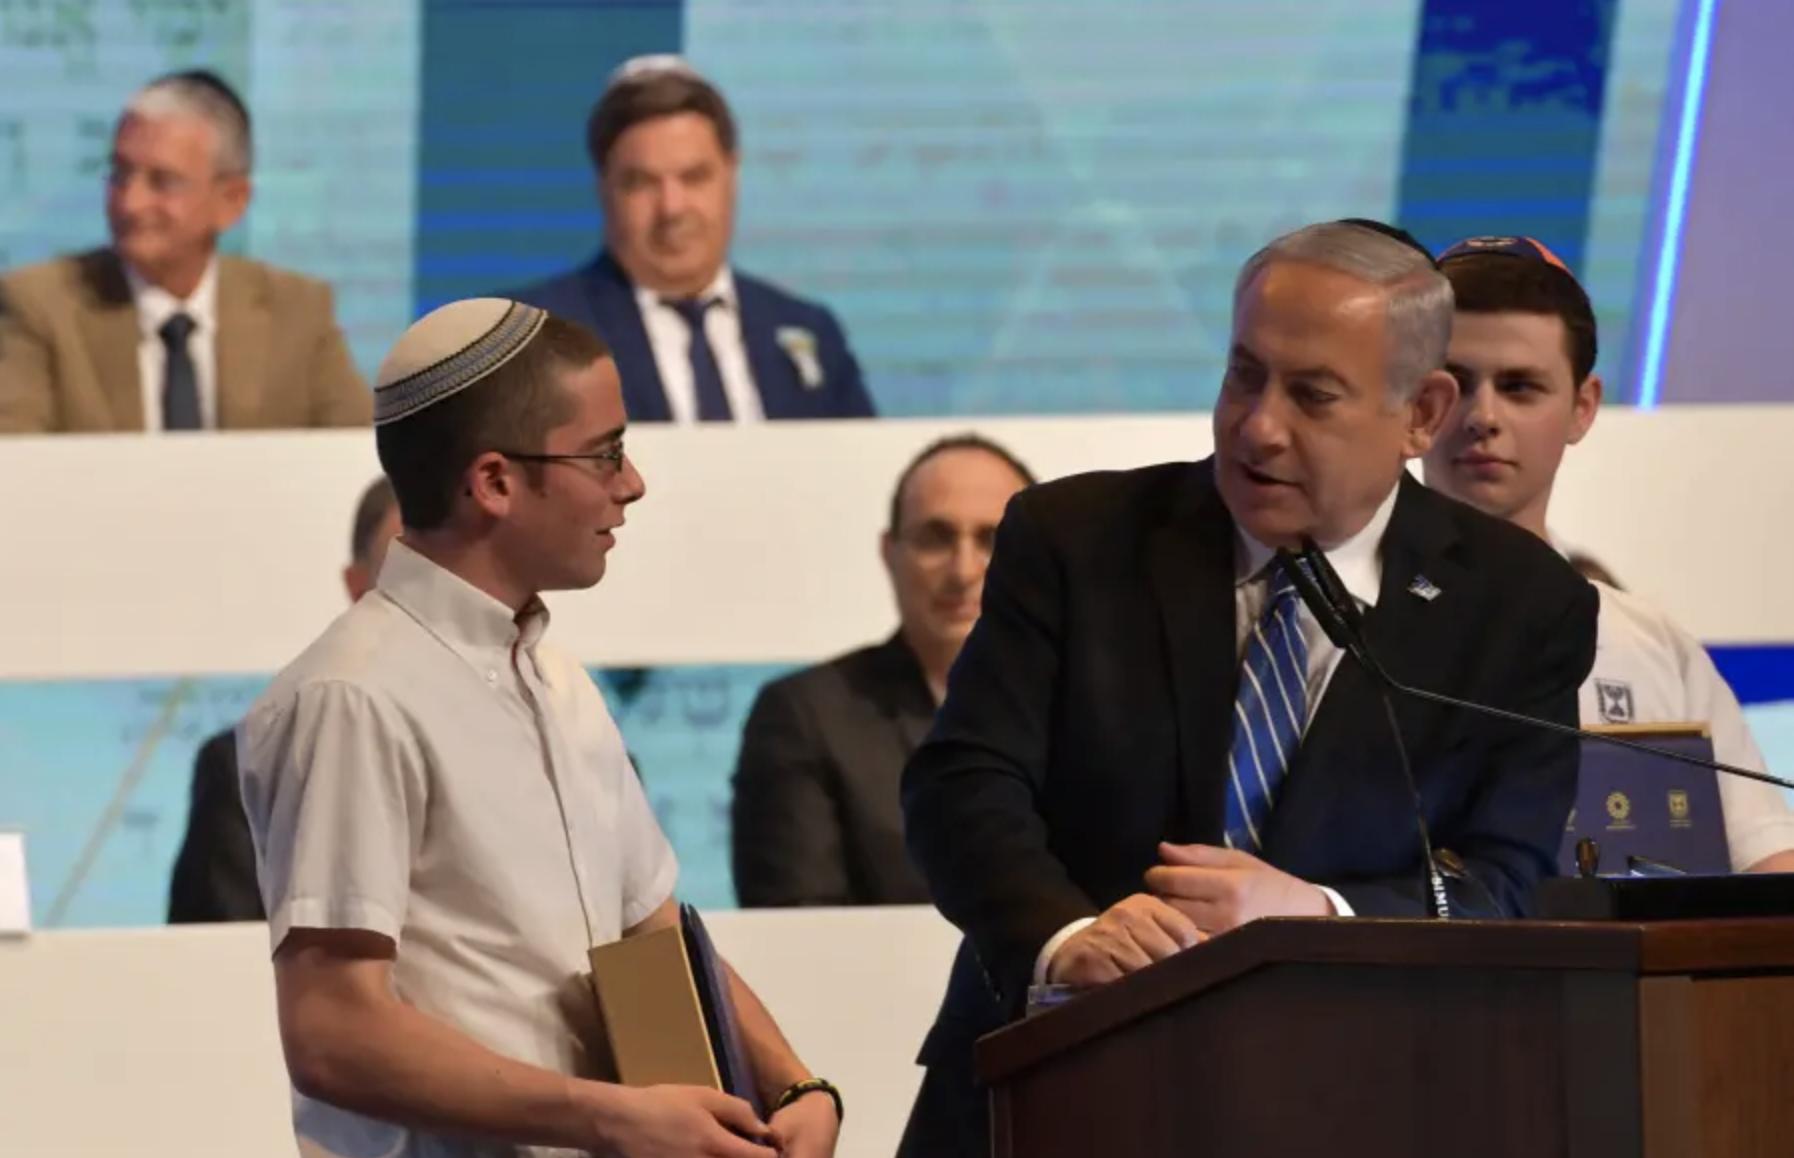 Yonatan Weissman with Prime Minister Benjamin Netanyahu after he won the International Bible Contest on May 9, 2019. Photo by Kobi Gideon/GPO.